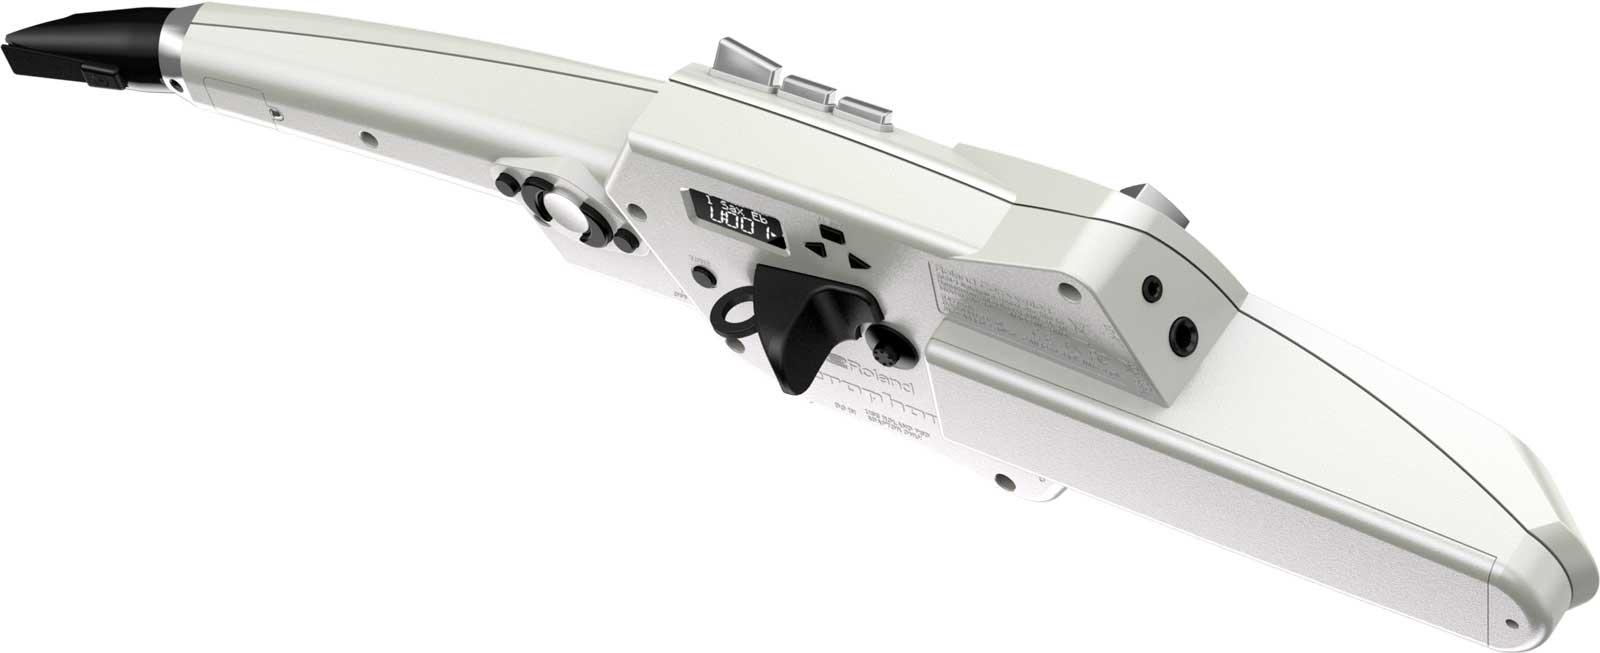 Roland AE-10电吹管即将在12月28号到货